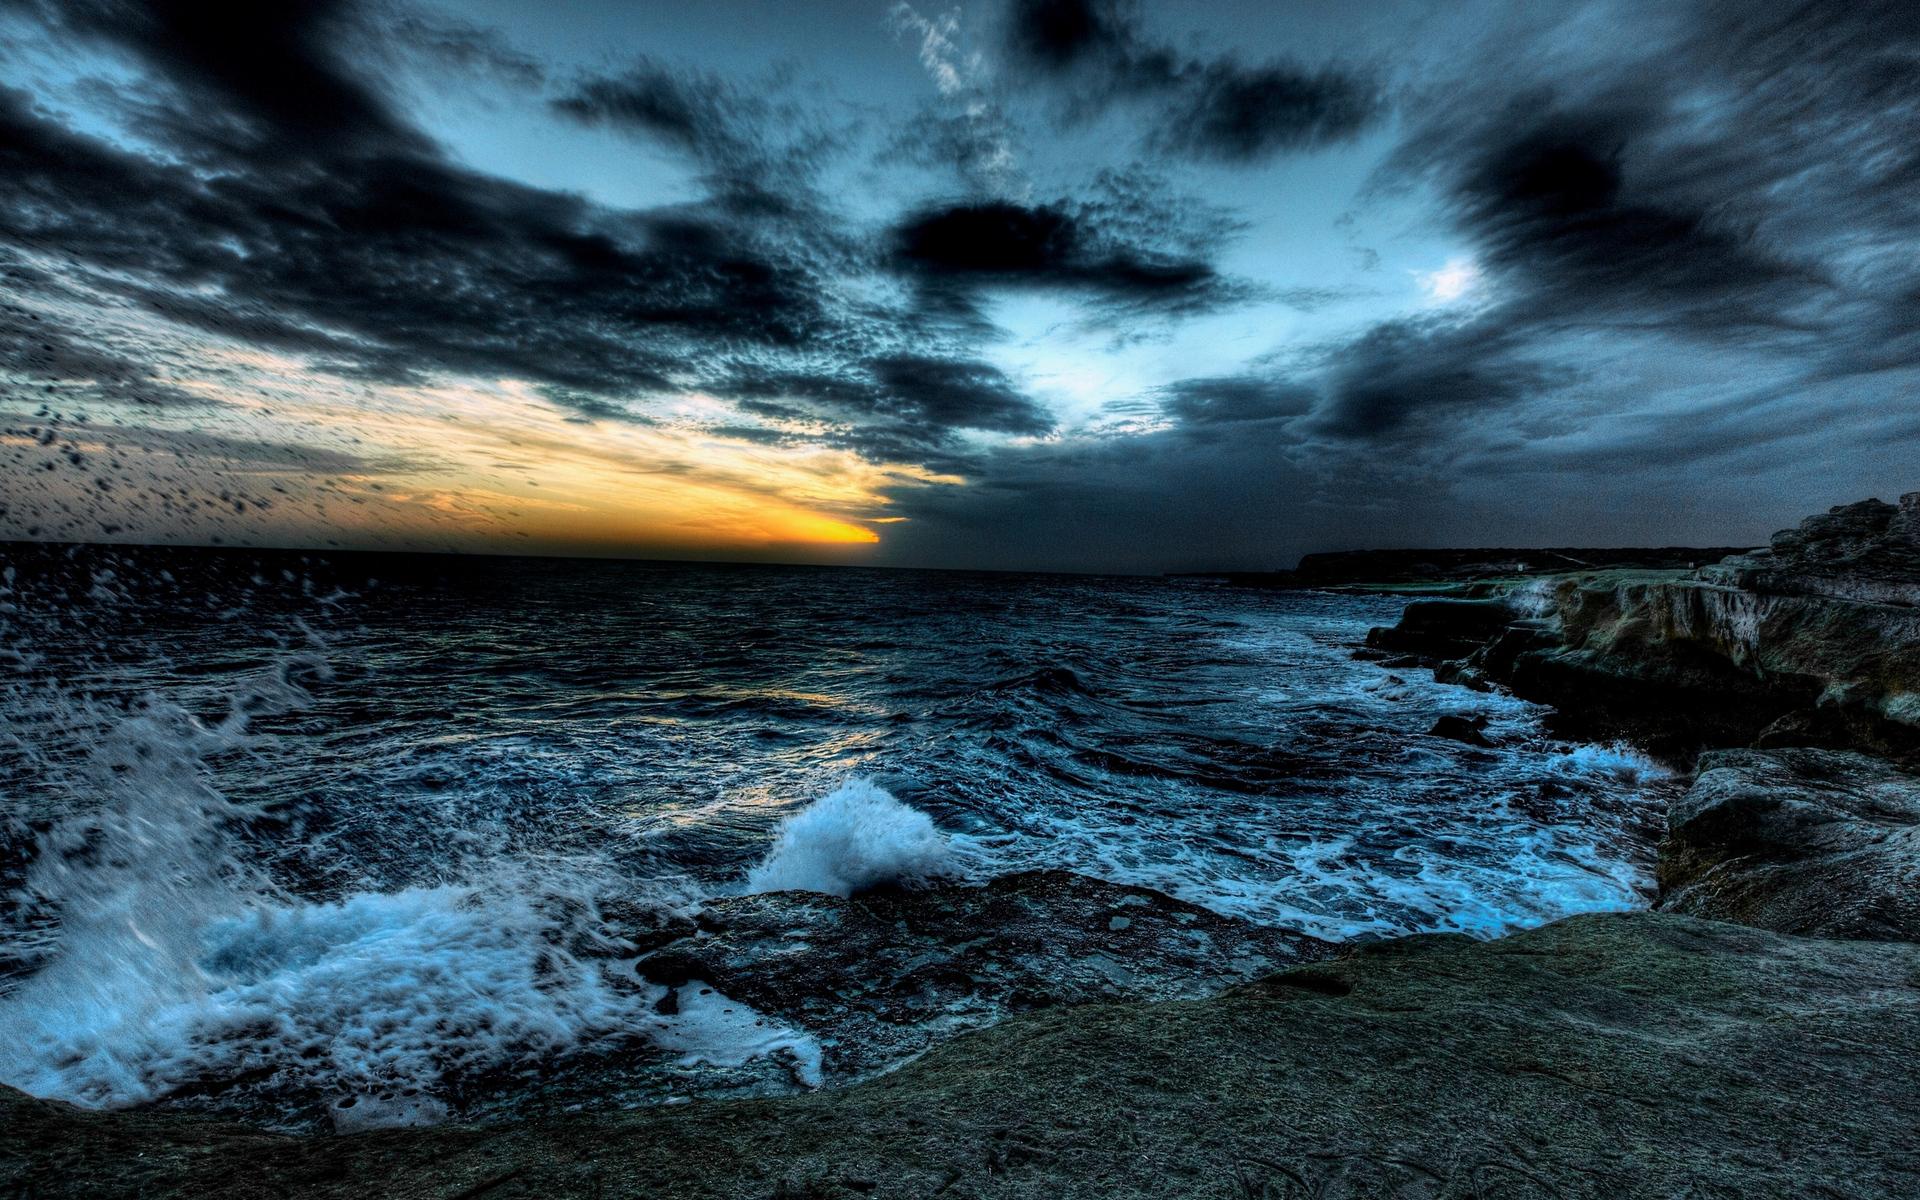 природа горизонт облака небо море nature horizon clouds the sky sea  № 2761317  скачать